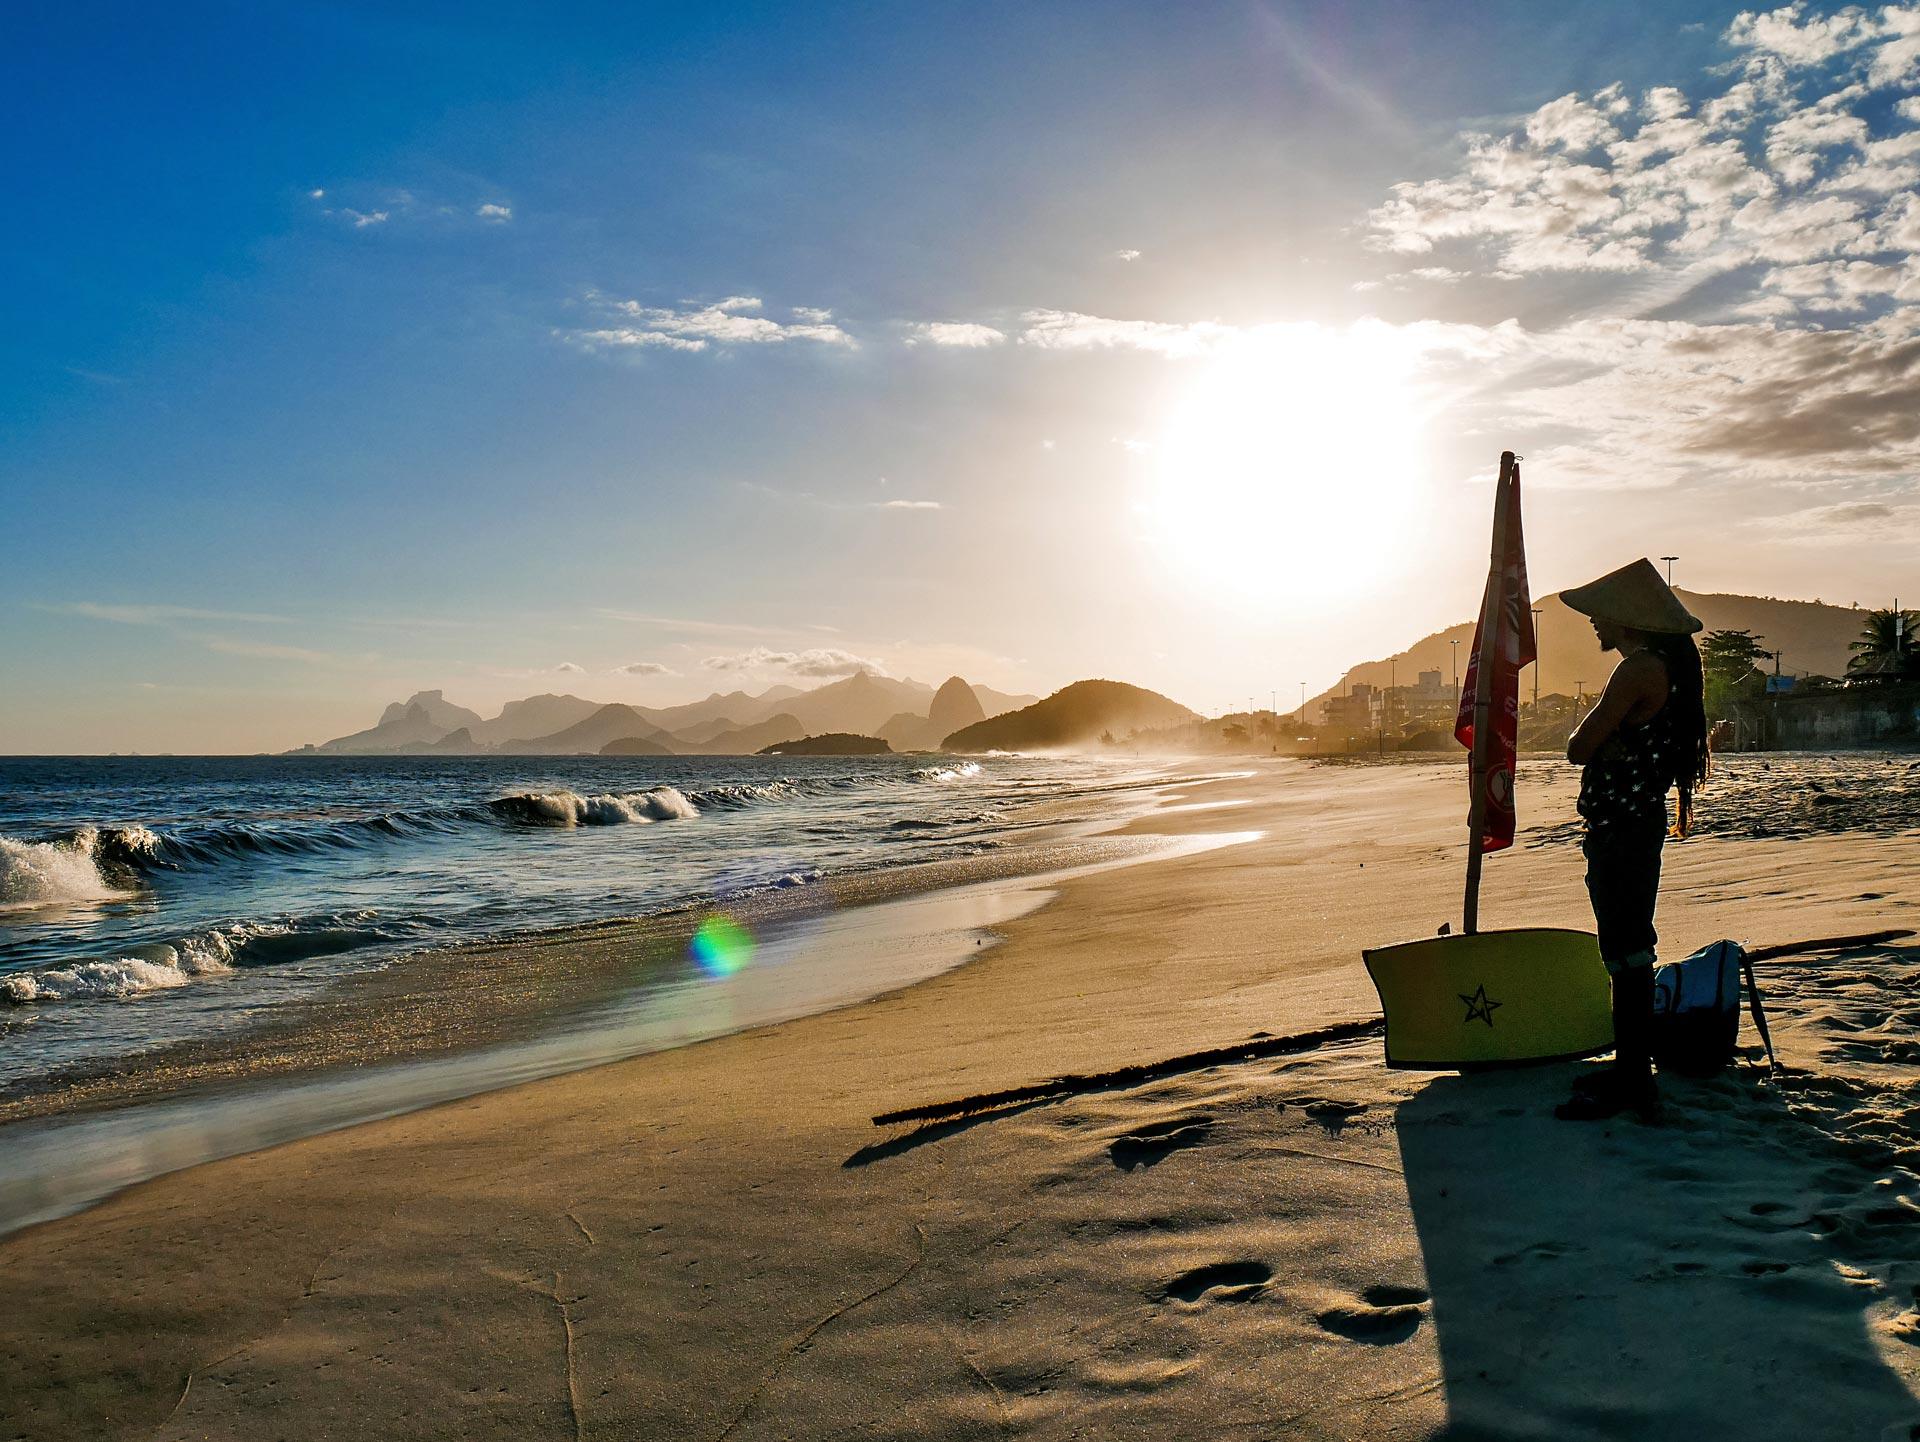 Rasta bodyboarder watching waves from Piratininga beach in Niterói, Brazil